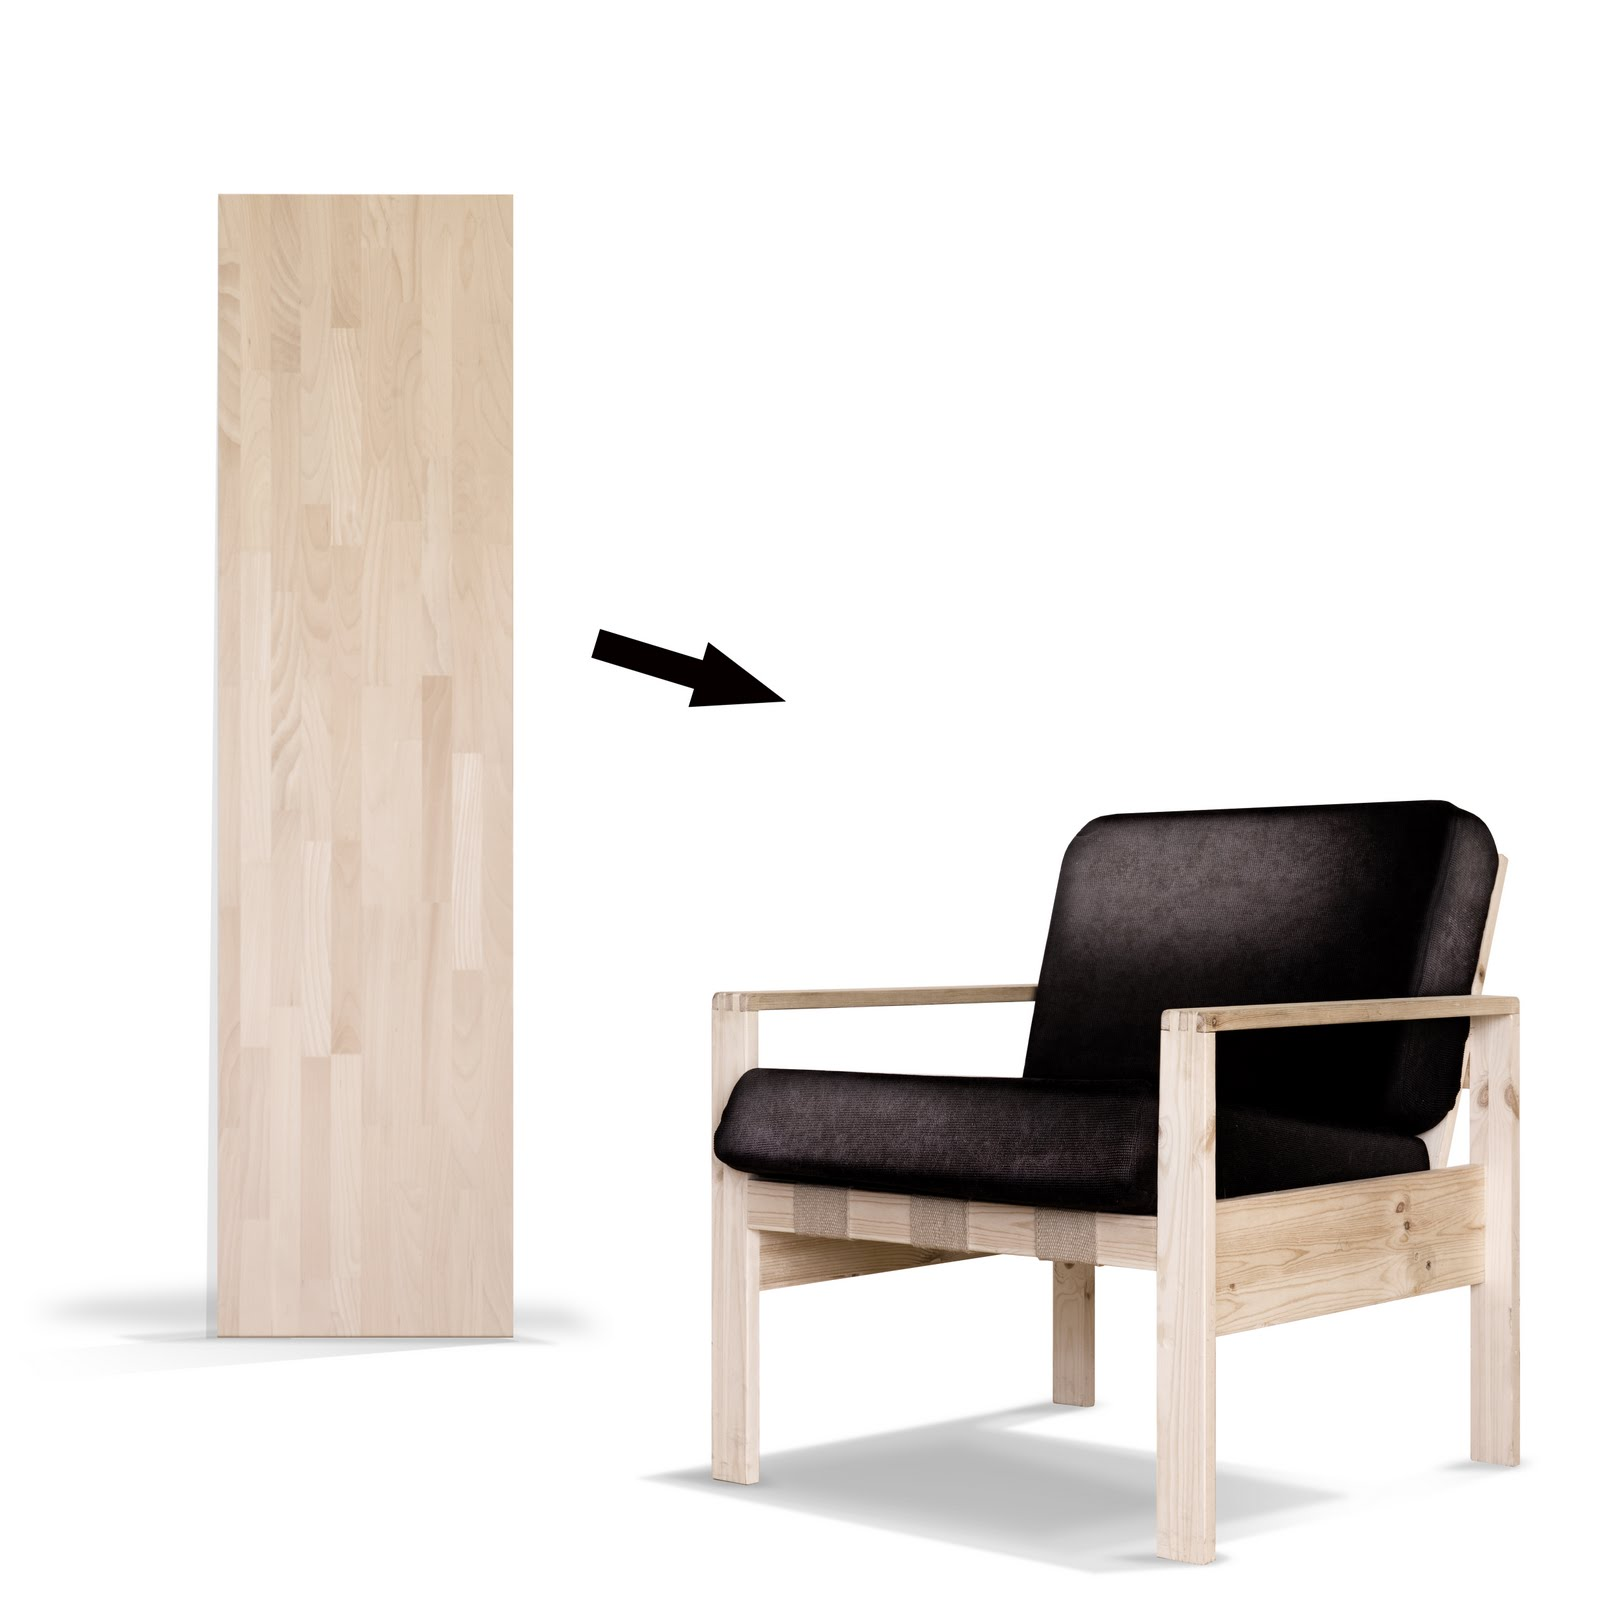 Hartz Iv Mobel 24 Euro Sessel 24 Euro Chair